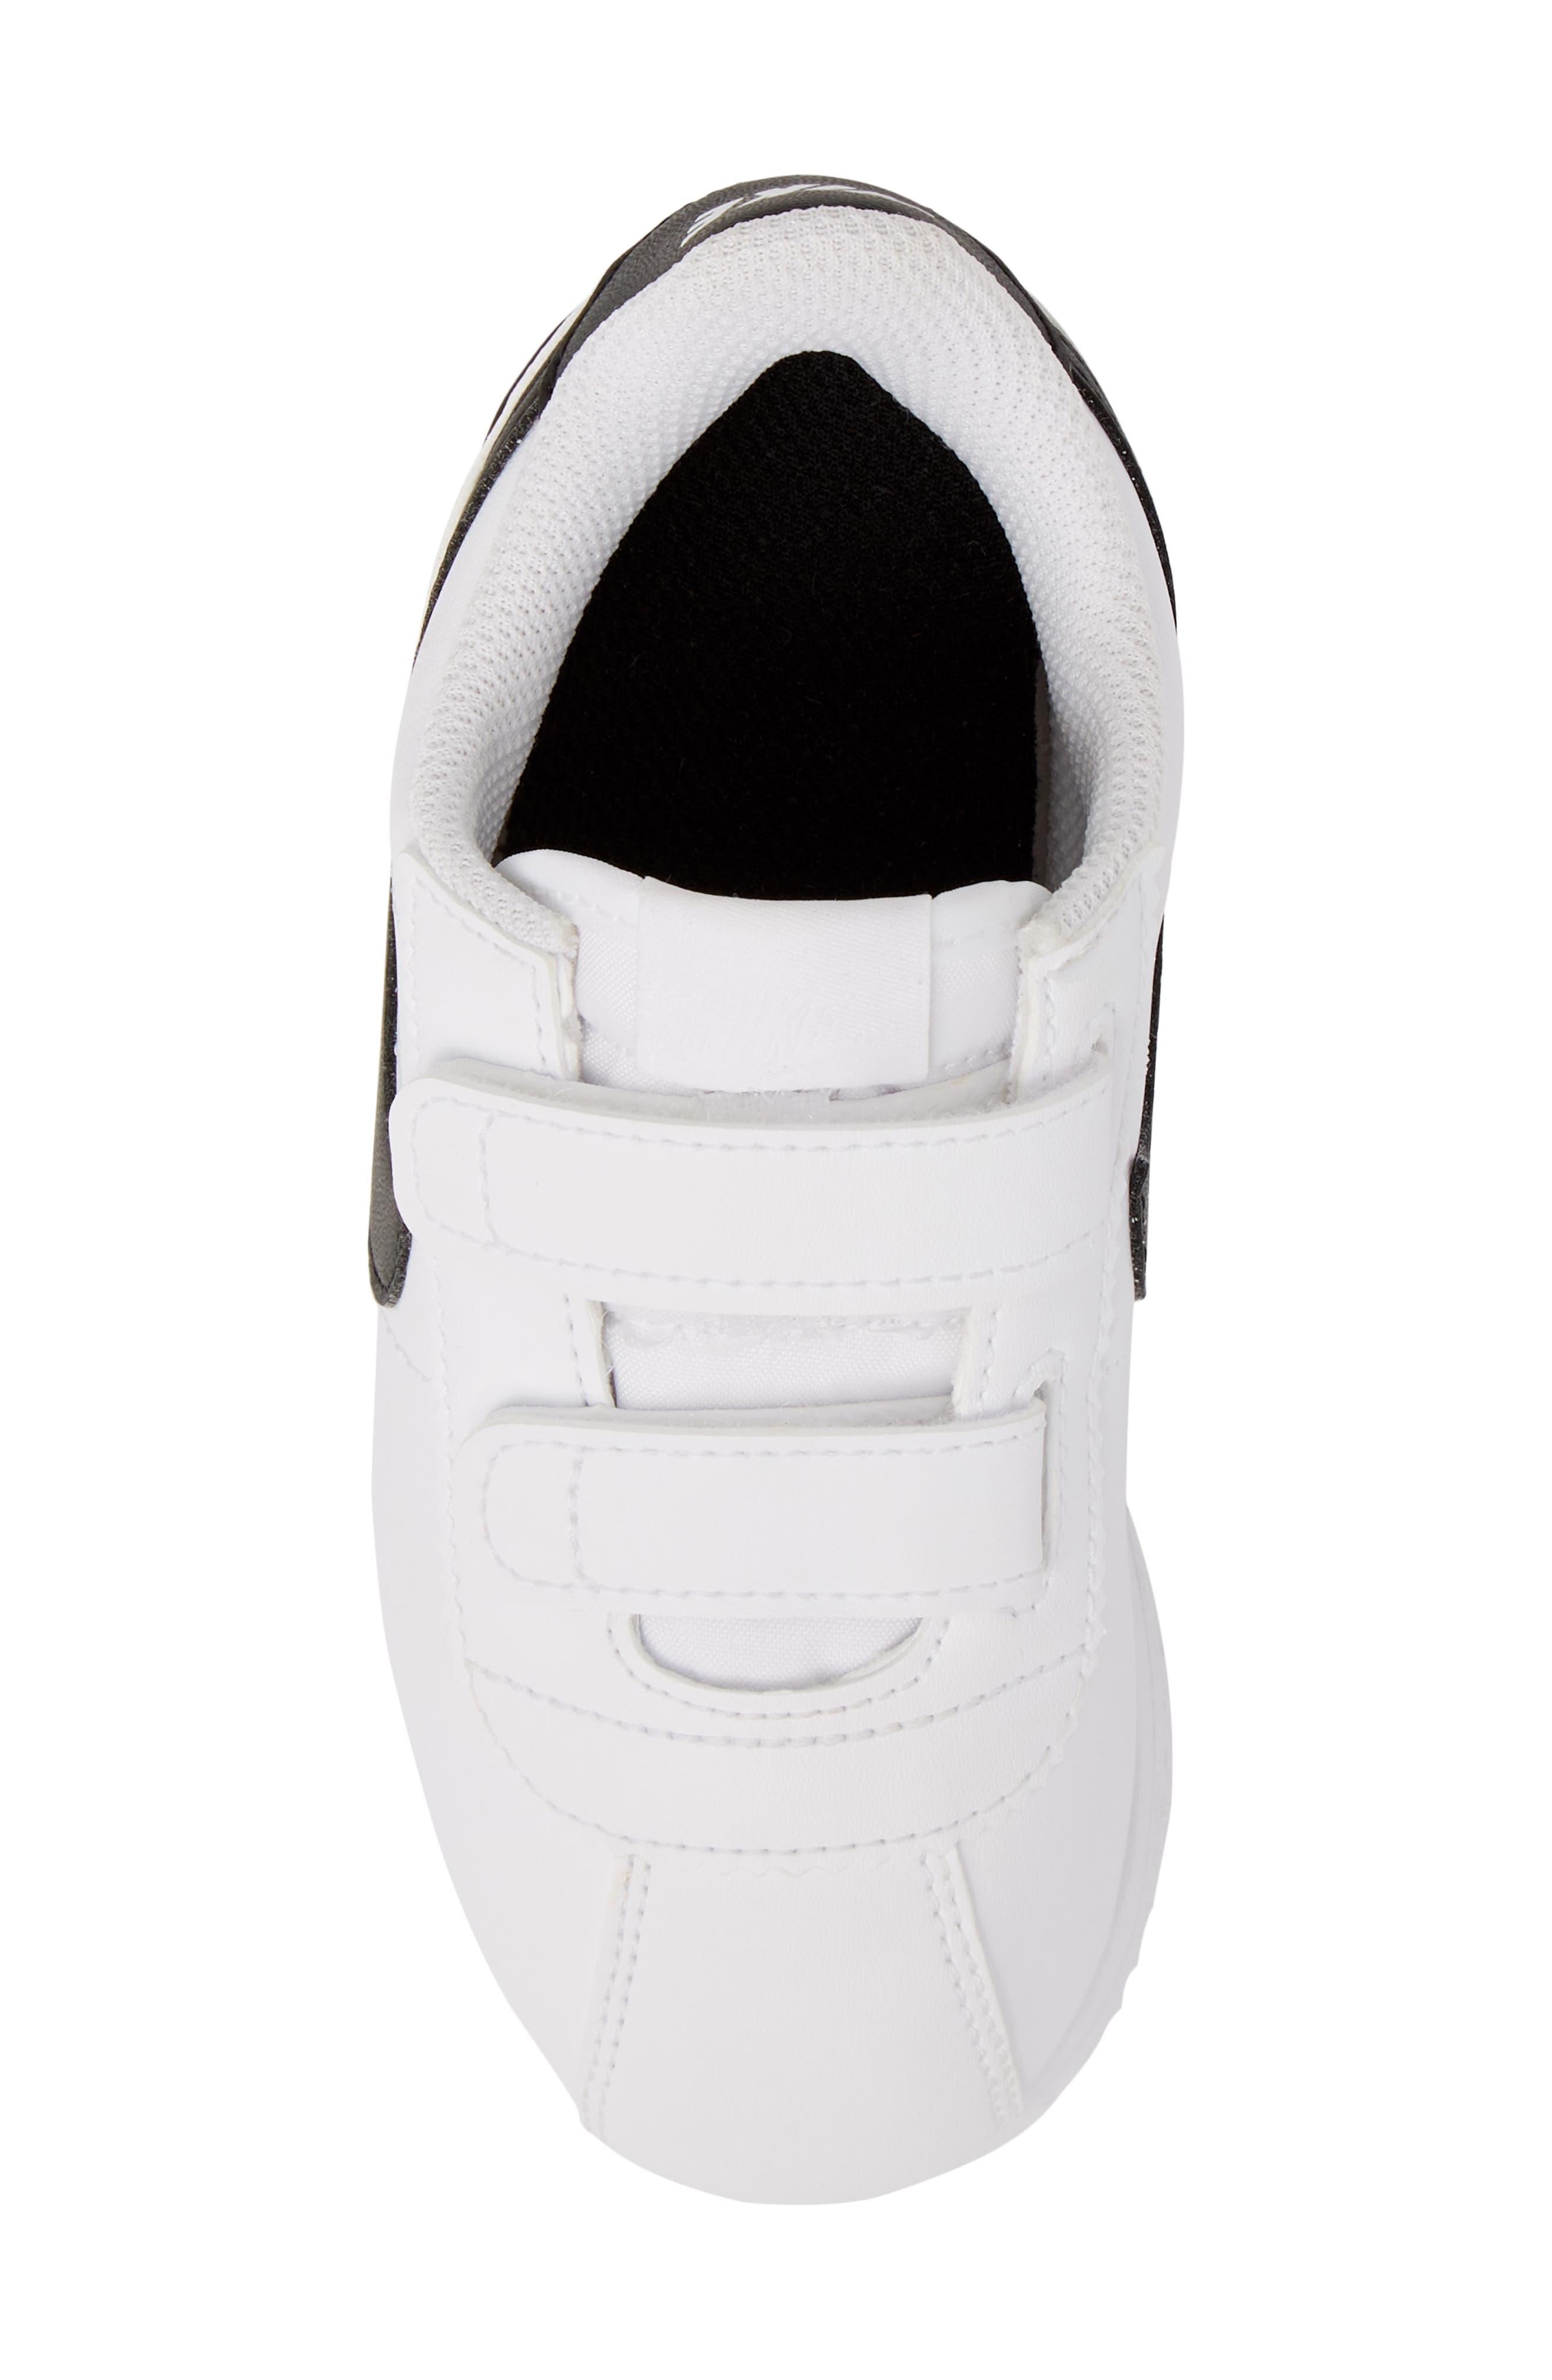 Cortez Basic SL Sneaker,                             Alternate thumbnail 5, color,                             White/ Black